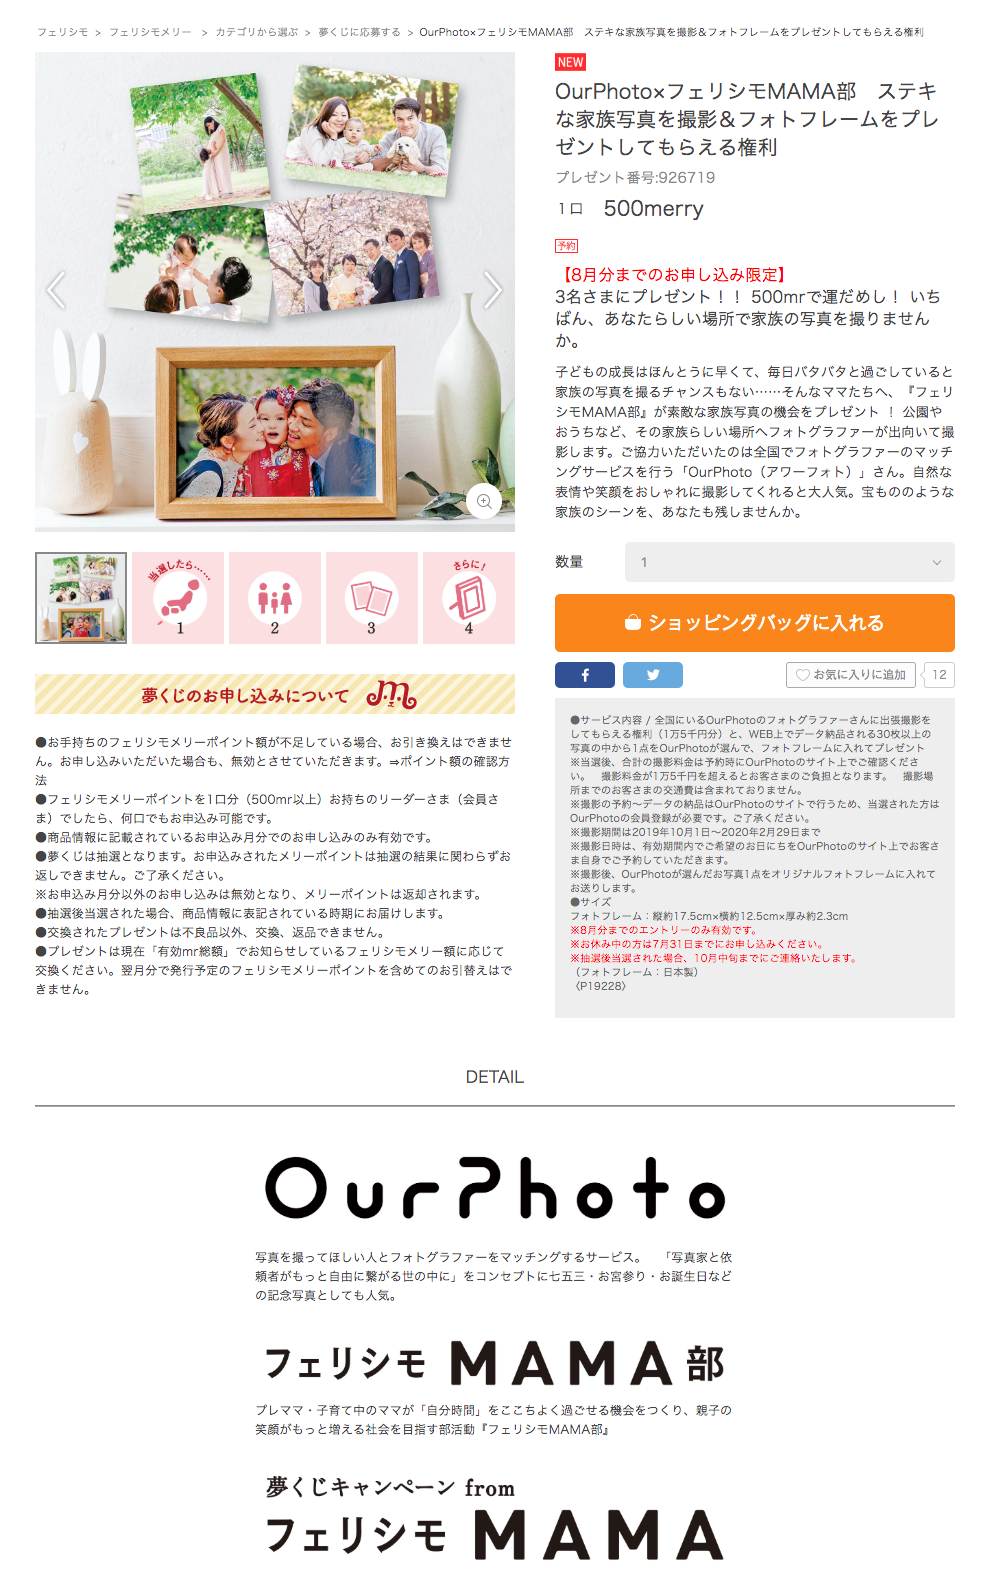 OurPhoto×フェリシモMAMA部 共同企画 夢くじ